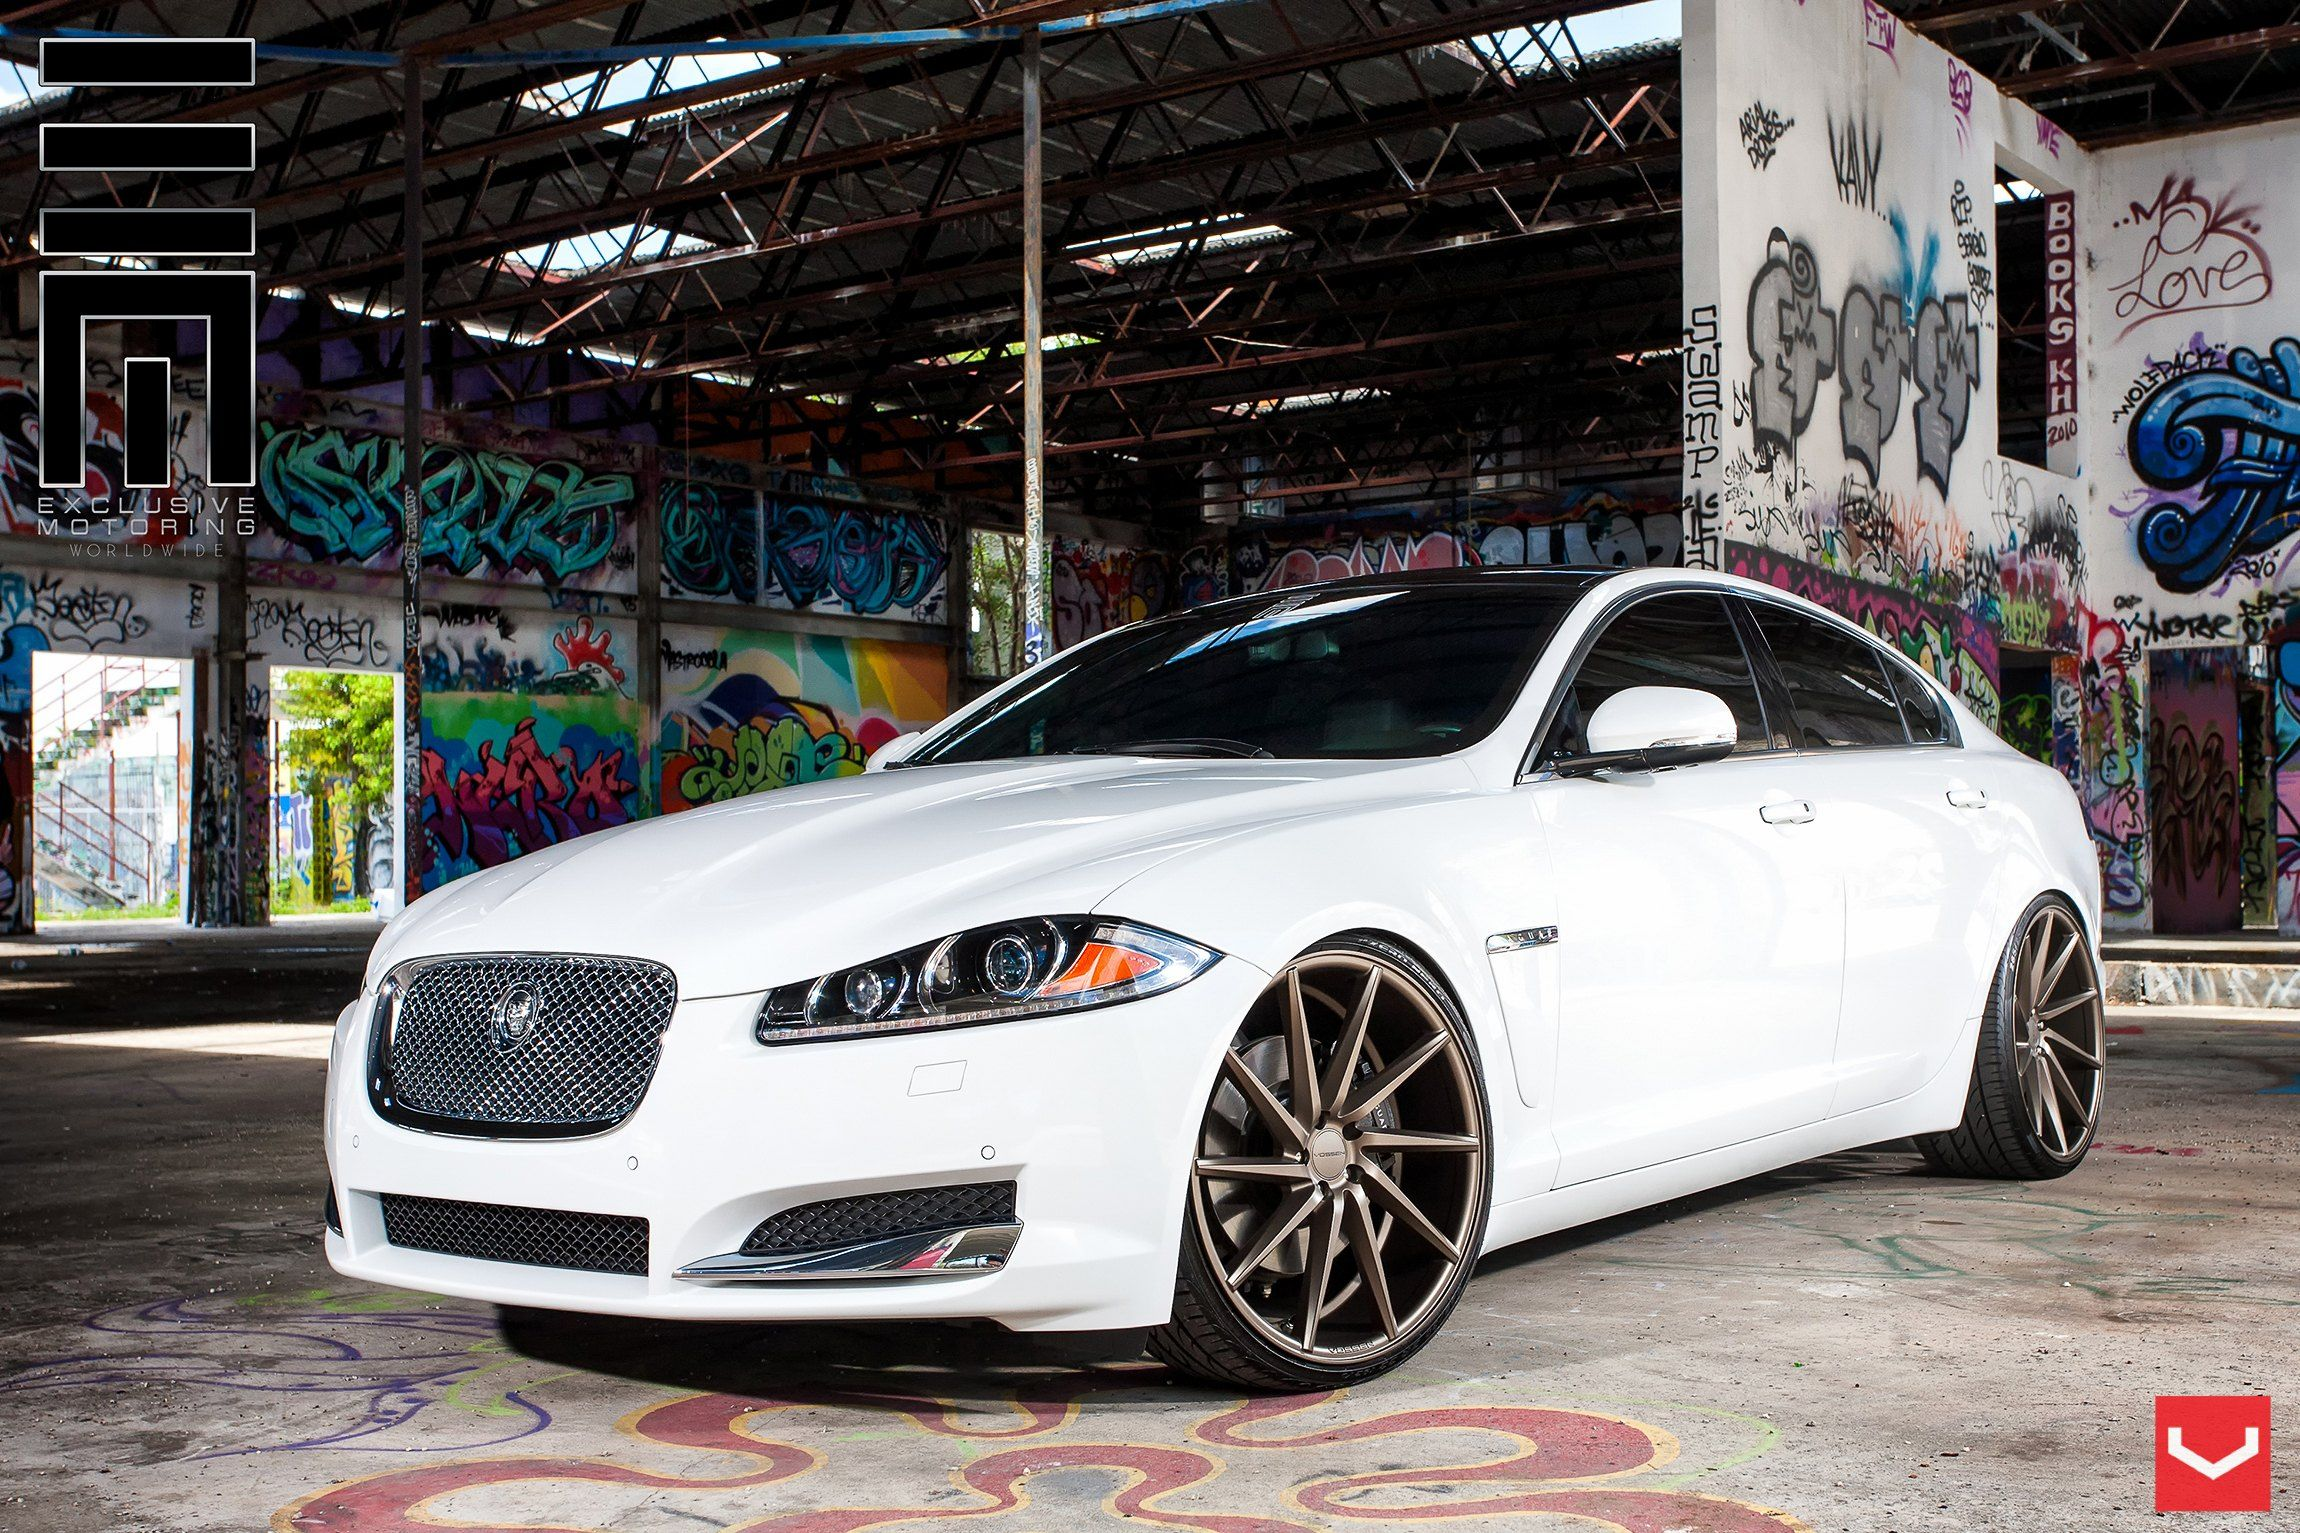 Diamond White Jaguar Xf Put On Classy Bronze Custom Wheels Jaguar Xf Jaguar Custom Wheels